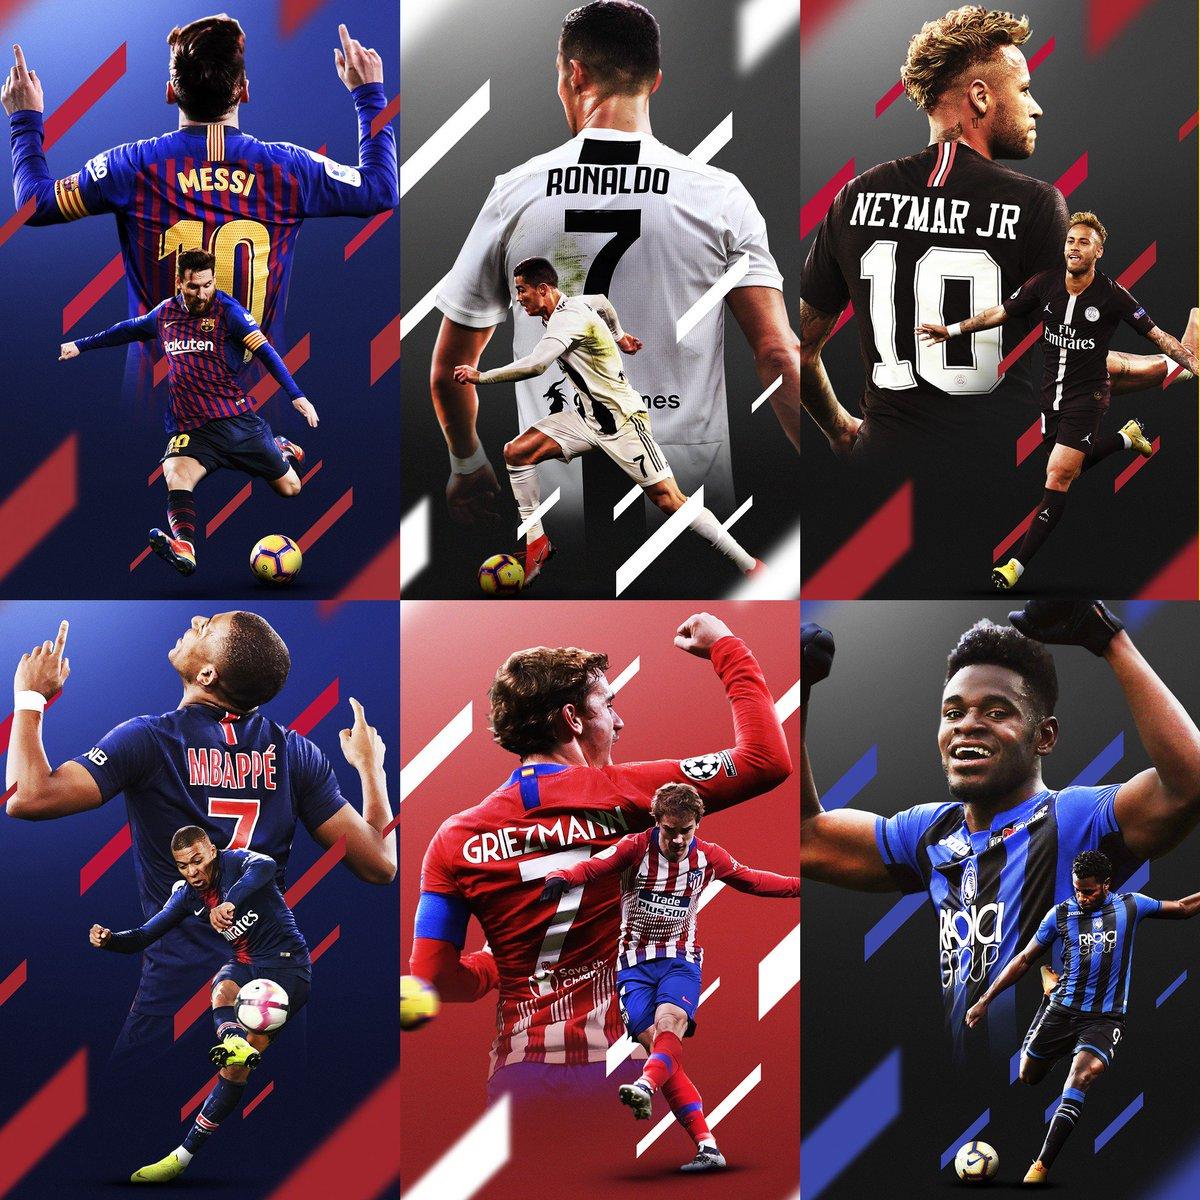 Emilio Sansolini On Twitter Some Messi Ronaldo Neymar